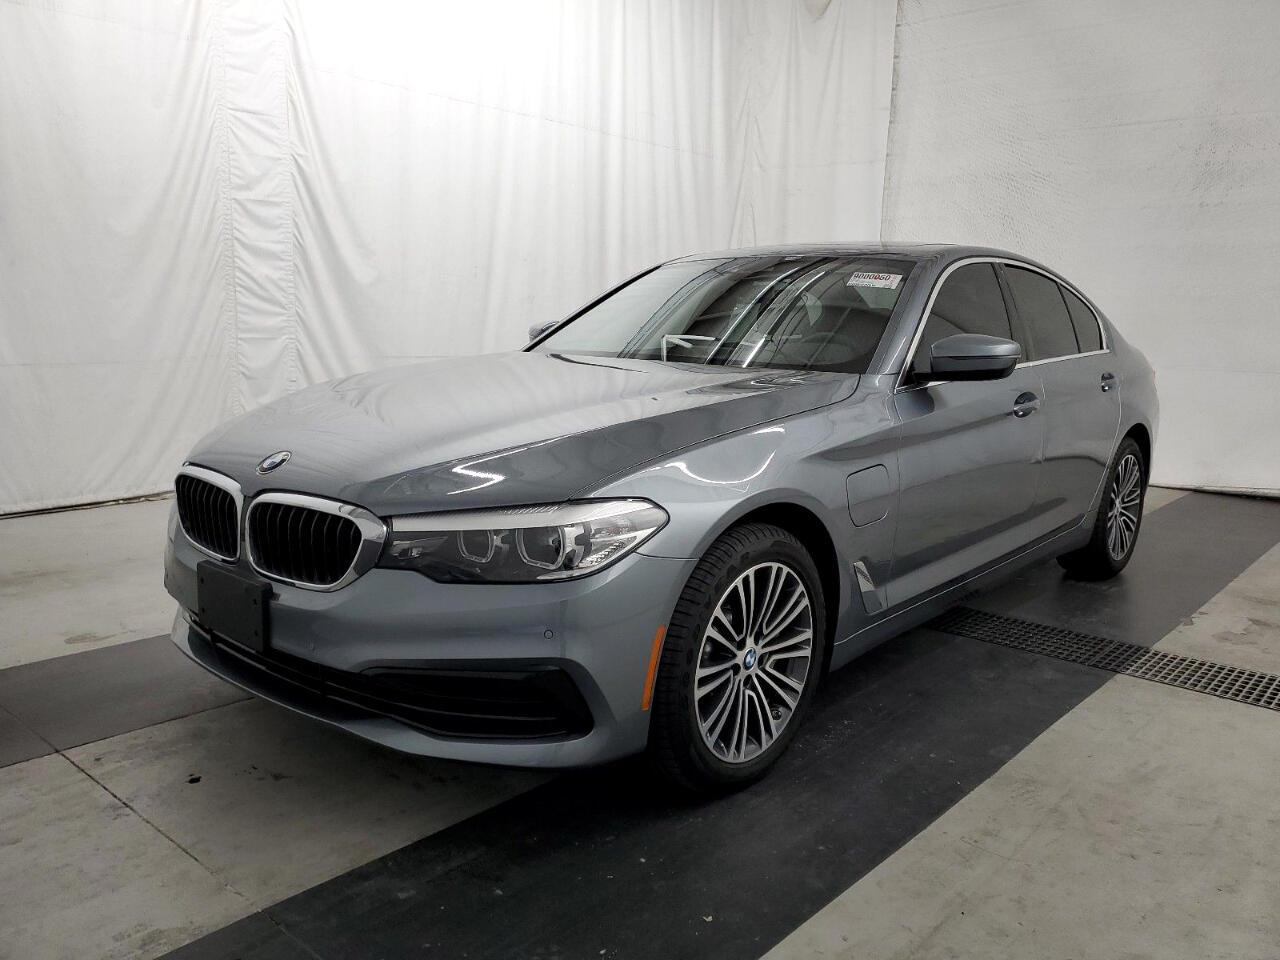 BMW 5 Series 530e iPerformance Plug-In Hybrid 2020